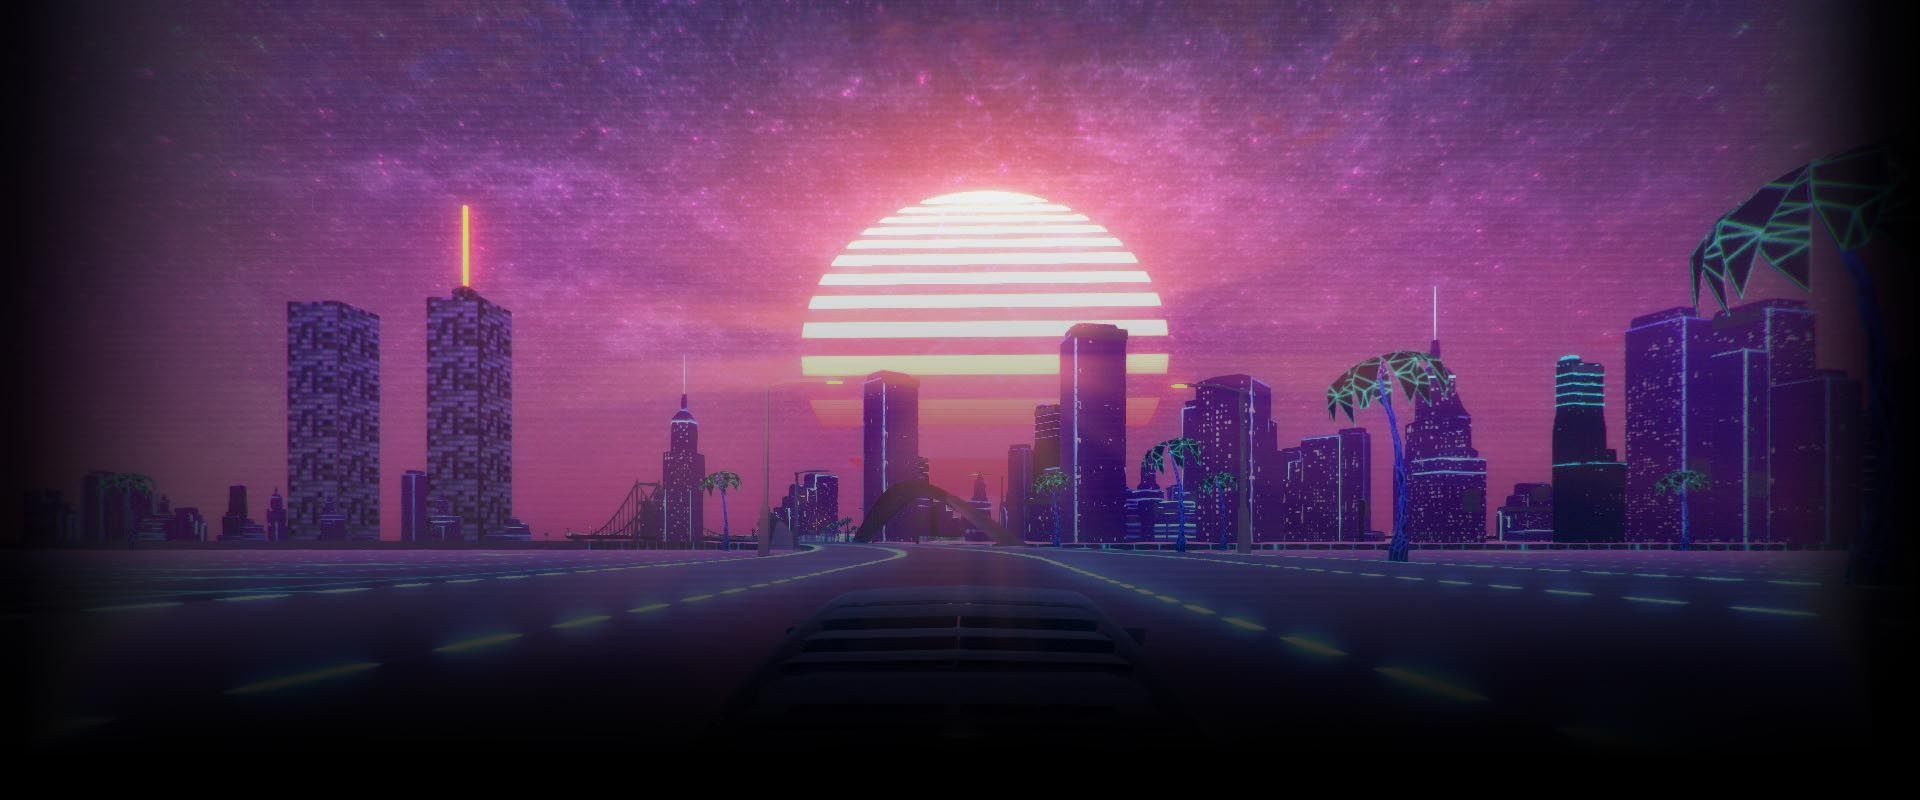 Sunset Aesthetic Vapor Wallpapers Top Free Sunset Aesthetic